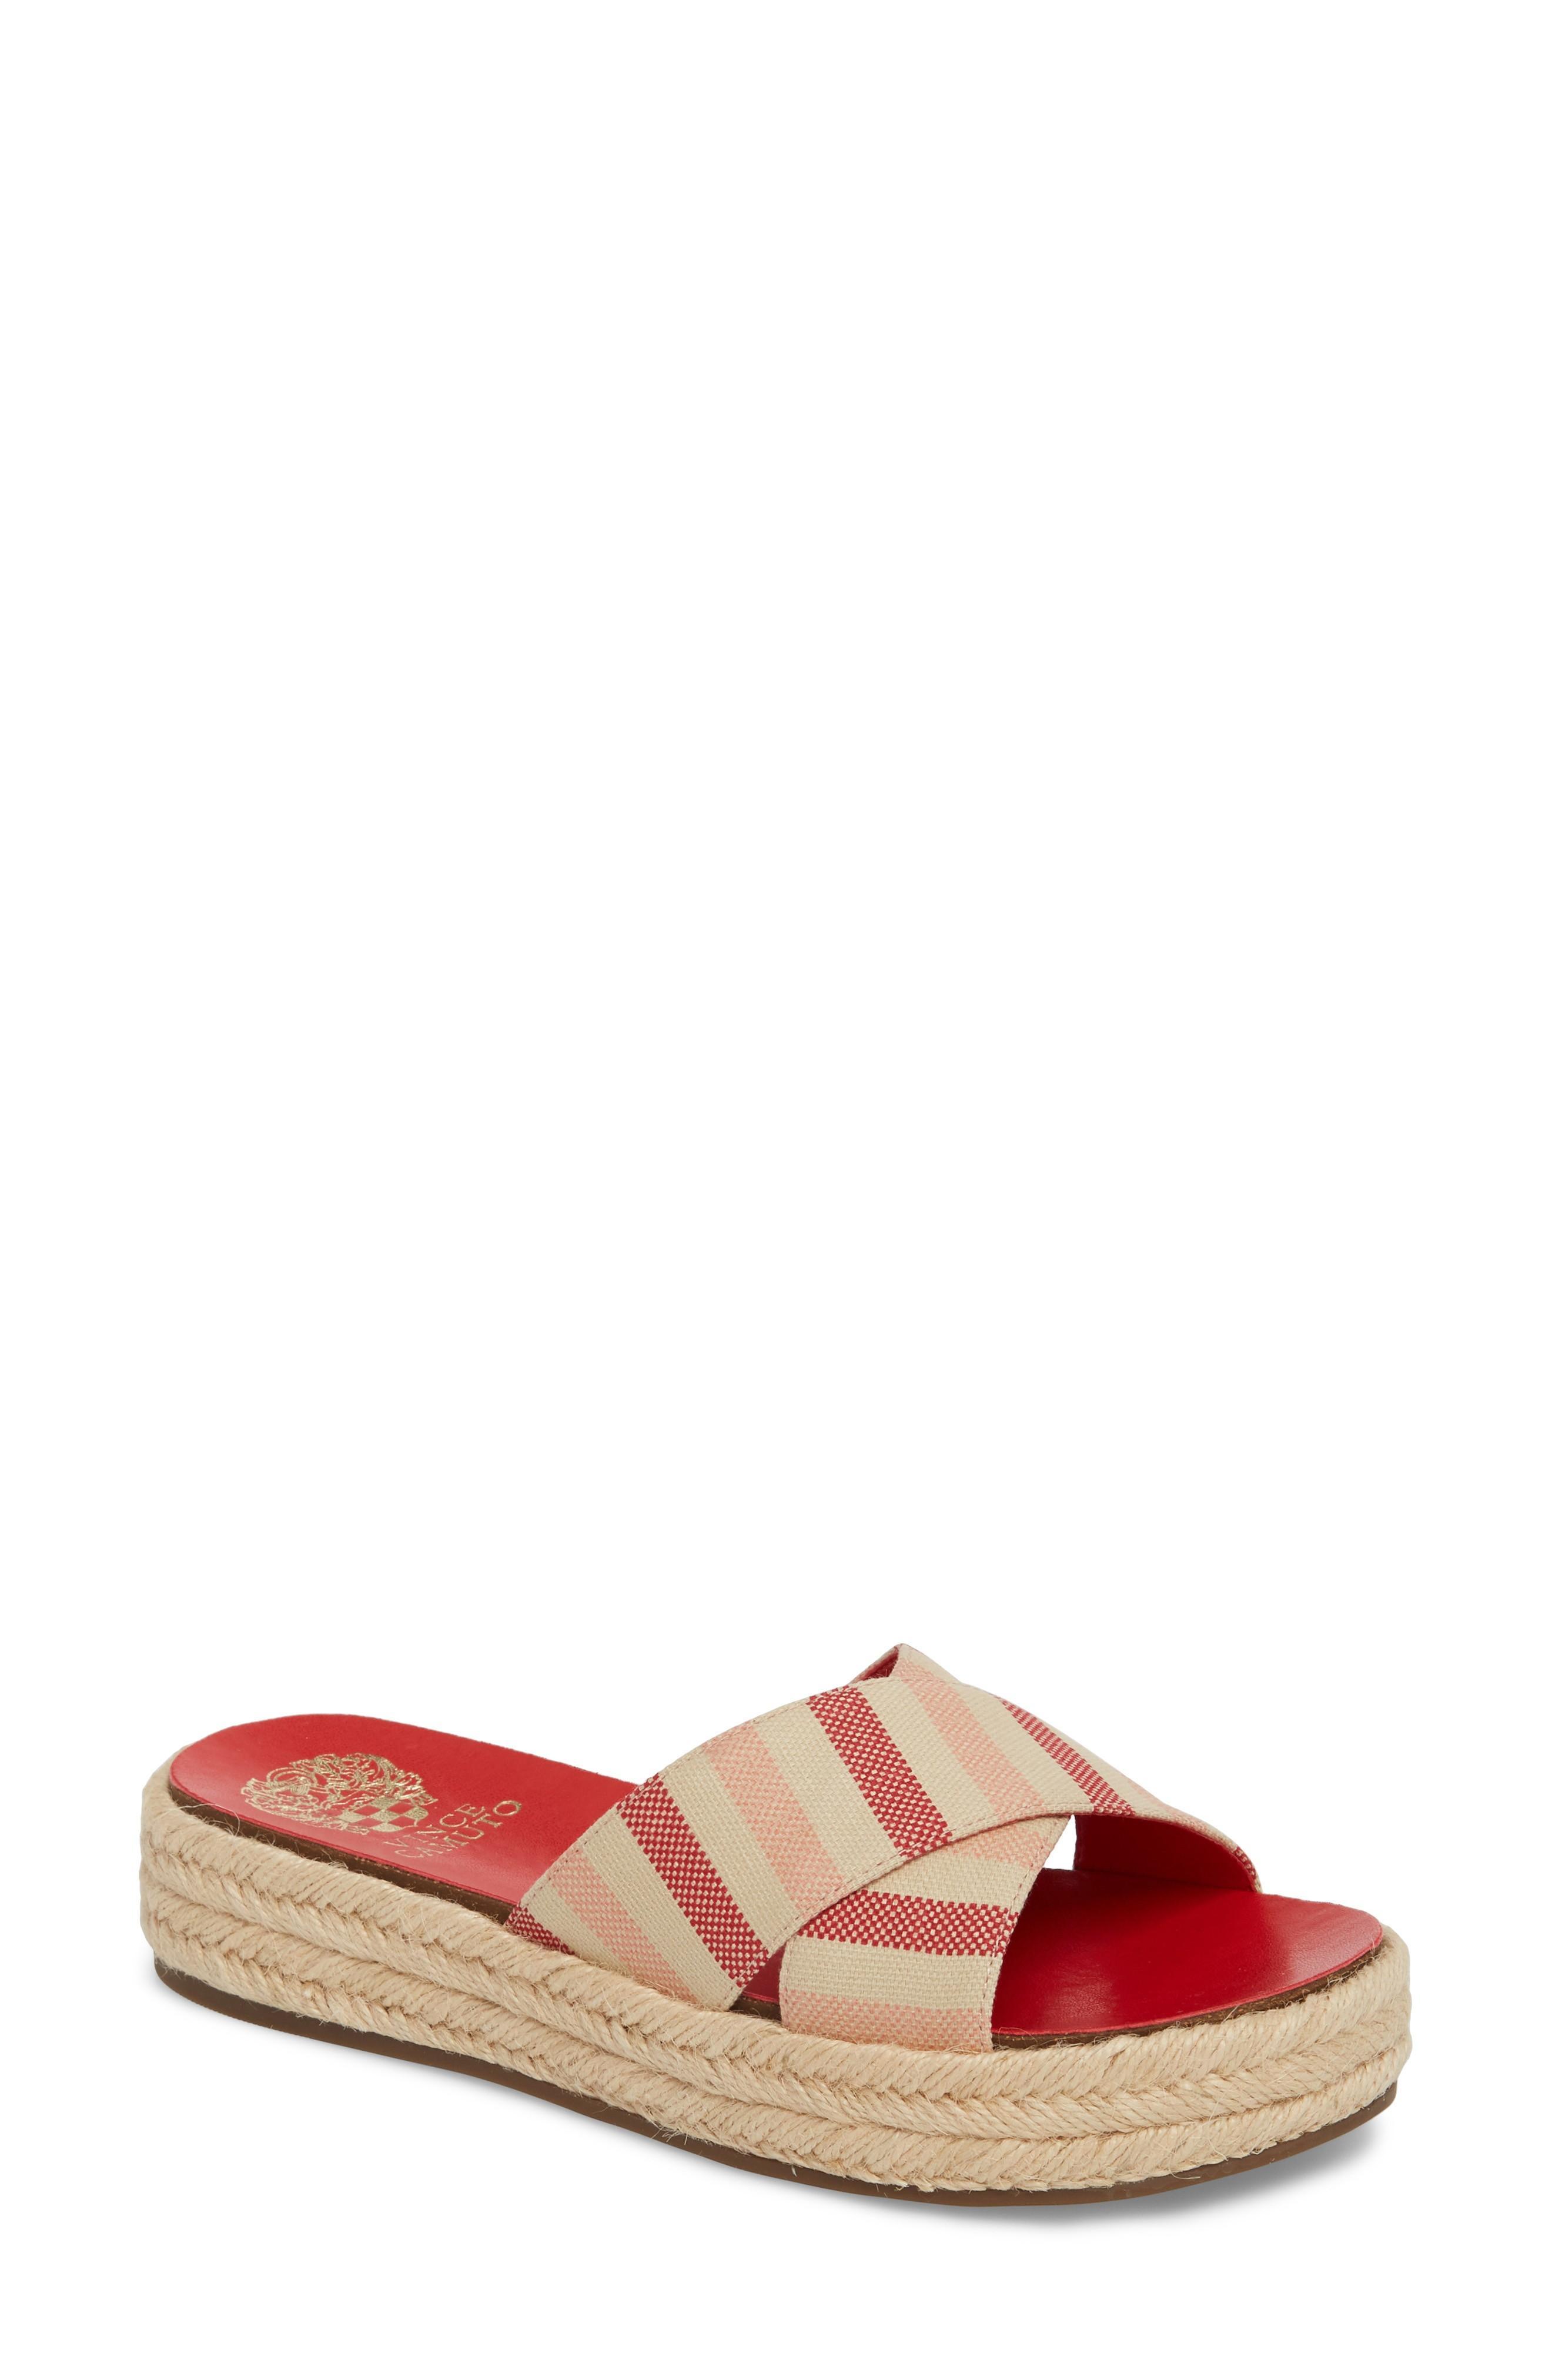 41a9ed5137d Vince Camuto Carran Platform Sandal In Metal Sand Leather